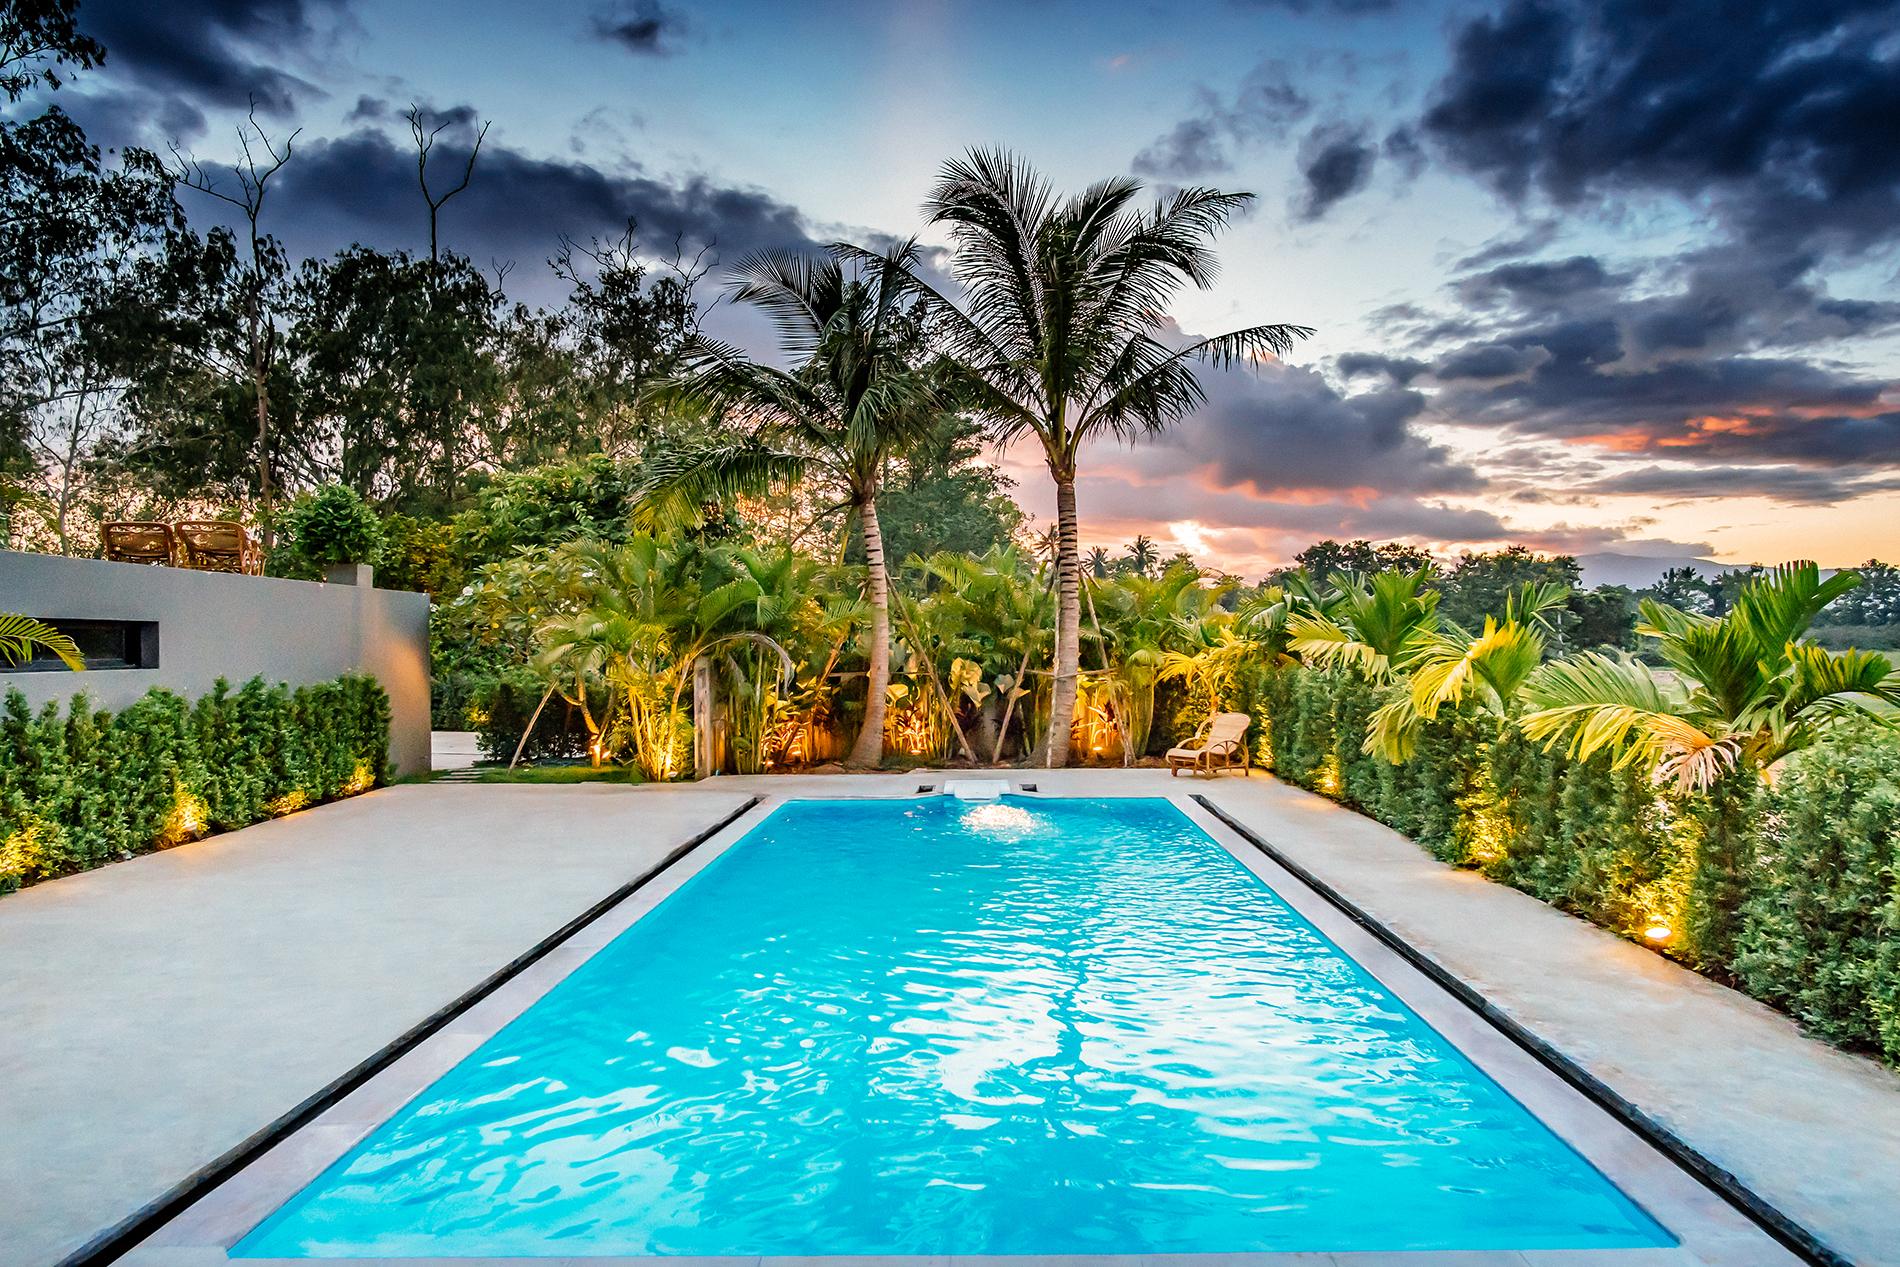 Thailand Luxury Real Estate Development Company | Swimming Pool Image